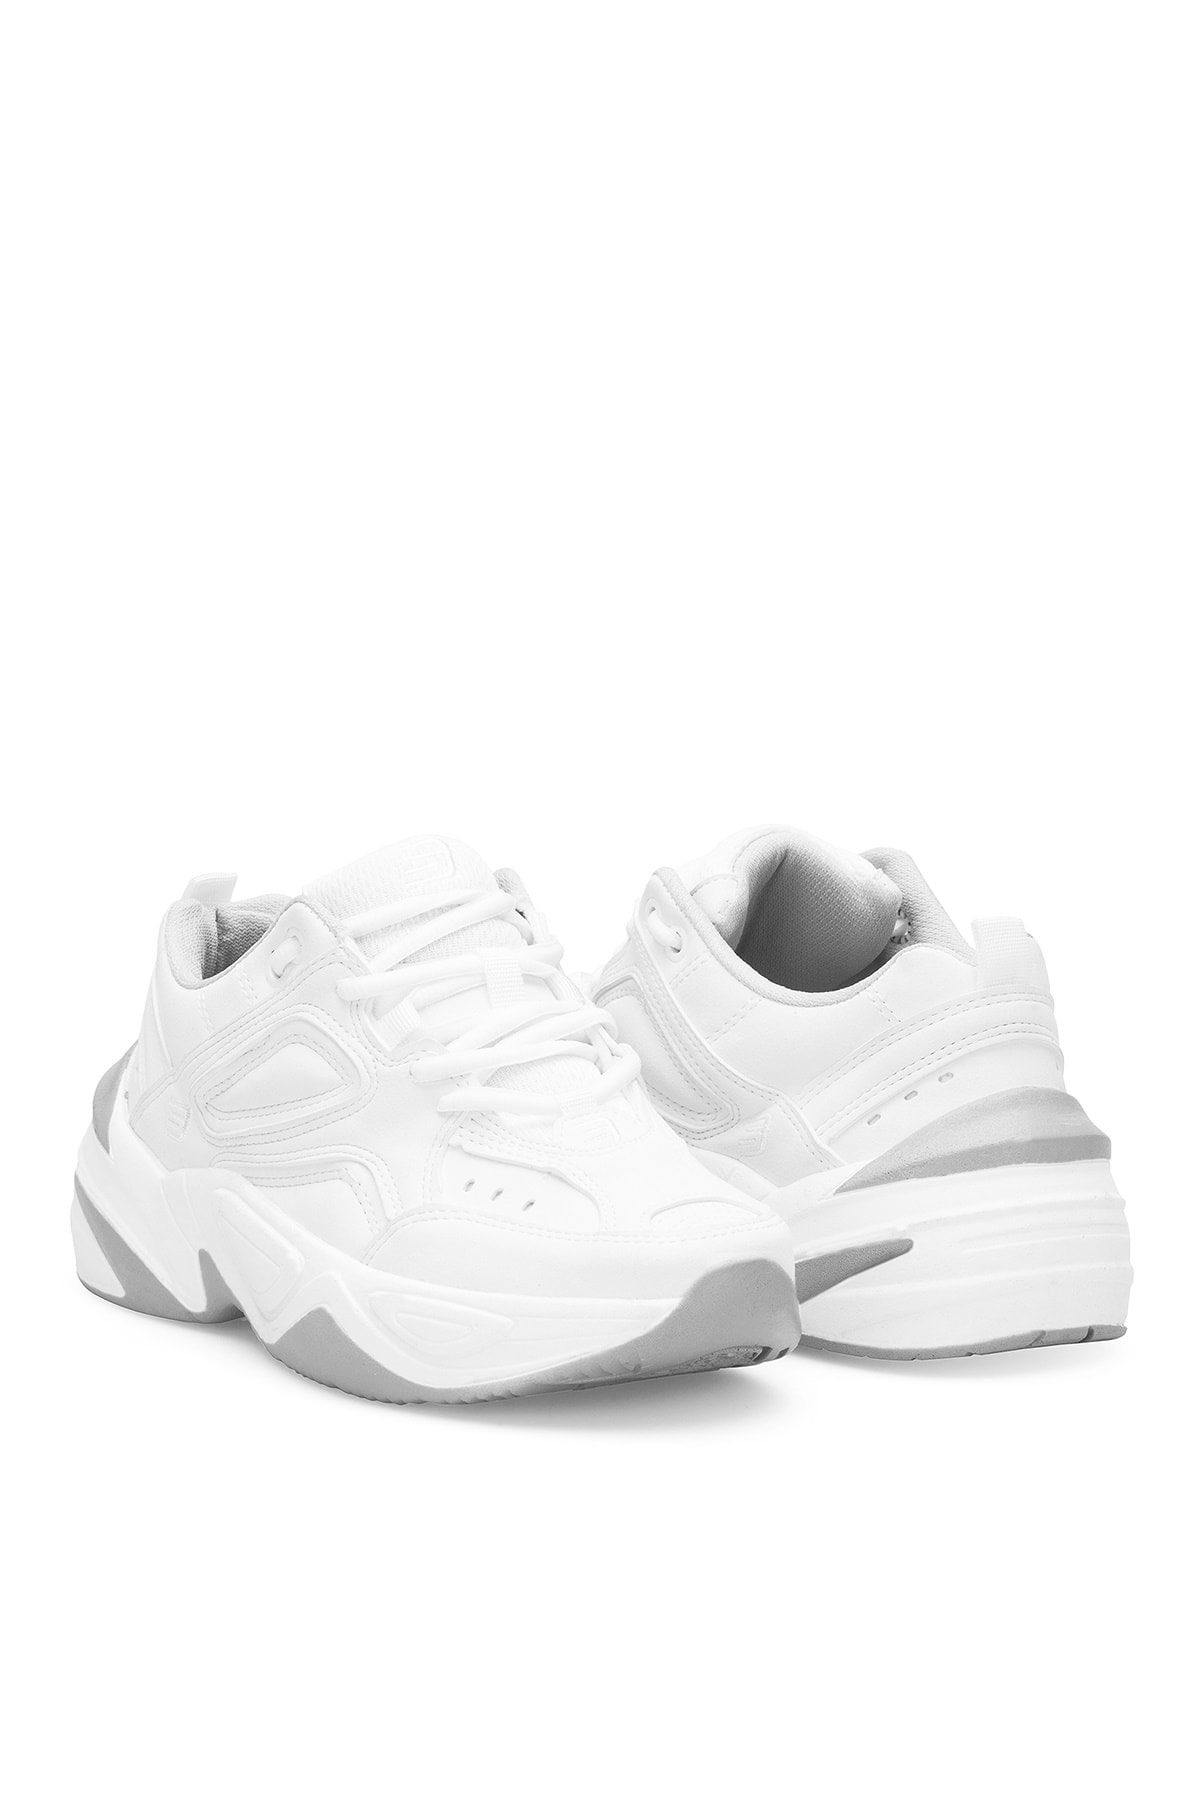 DARK SEER Full Beyaz Unisex Sneaker 2